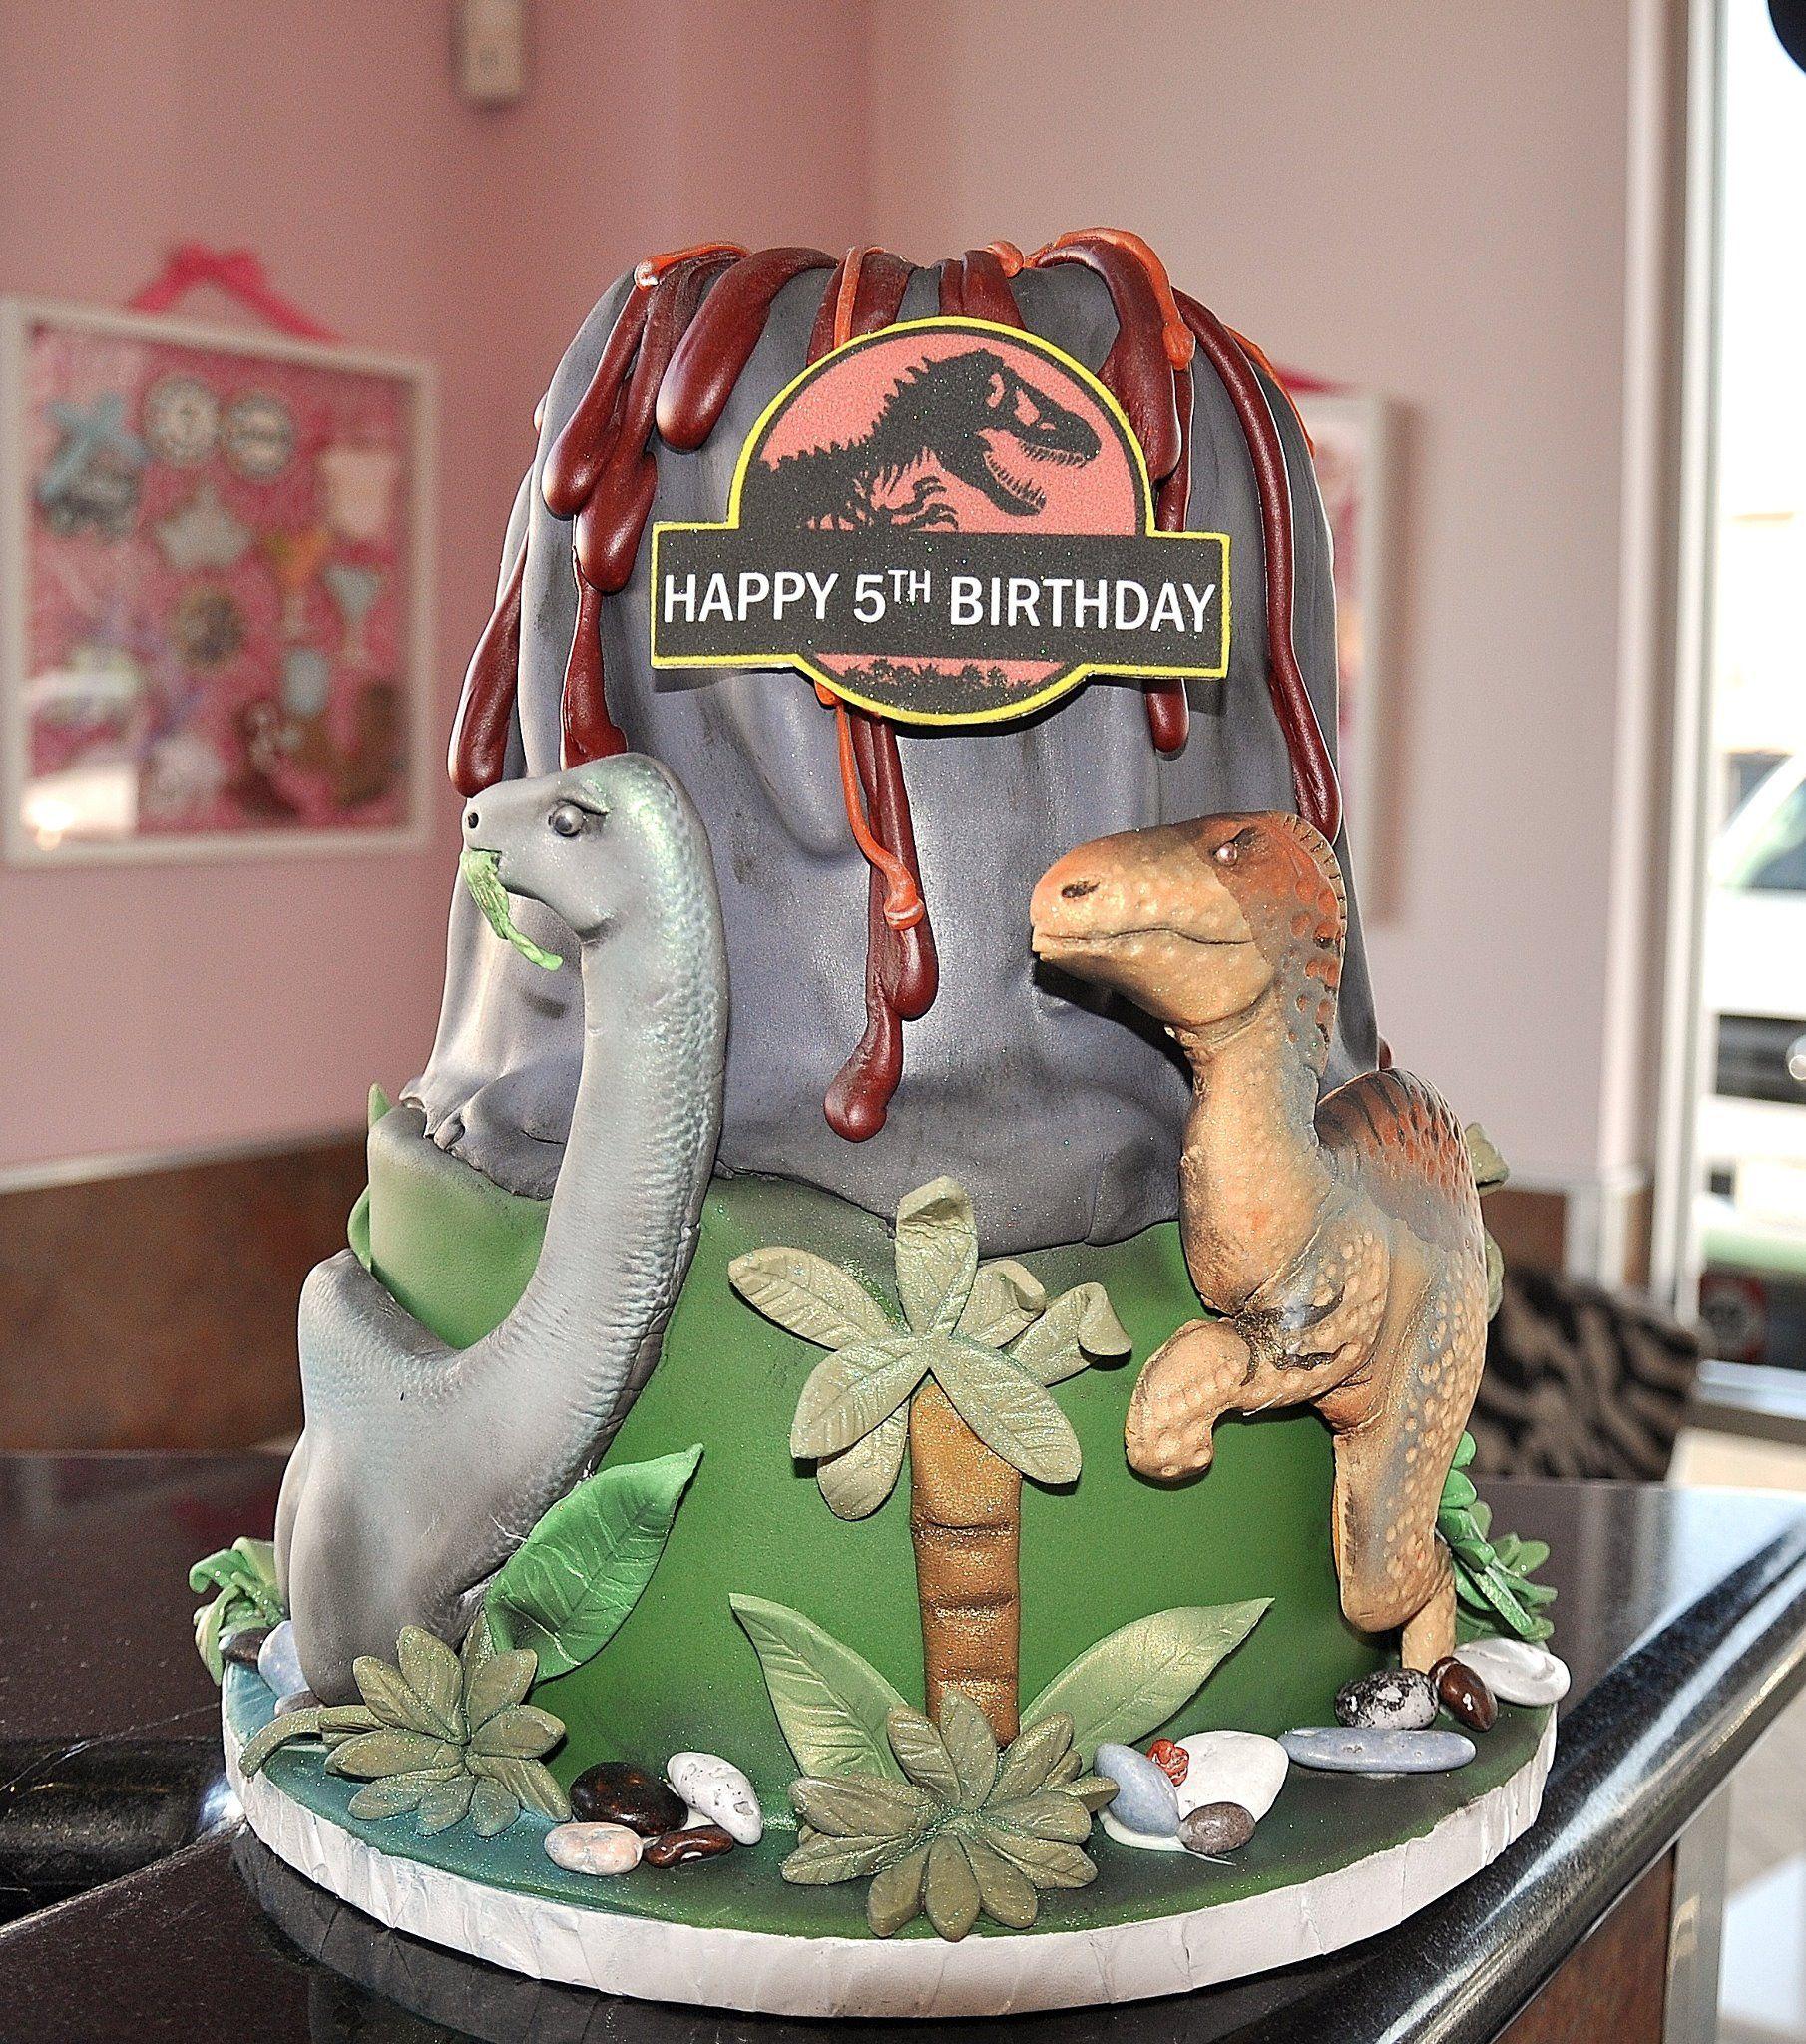 Southern Blue Celebrations Jurassic Park Jurassic World